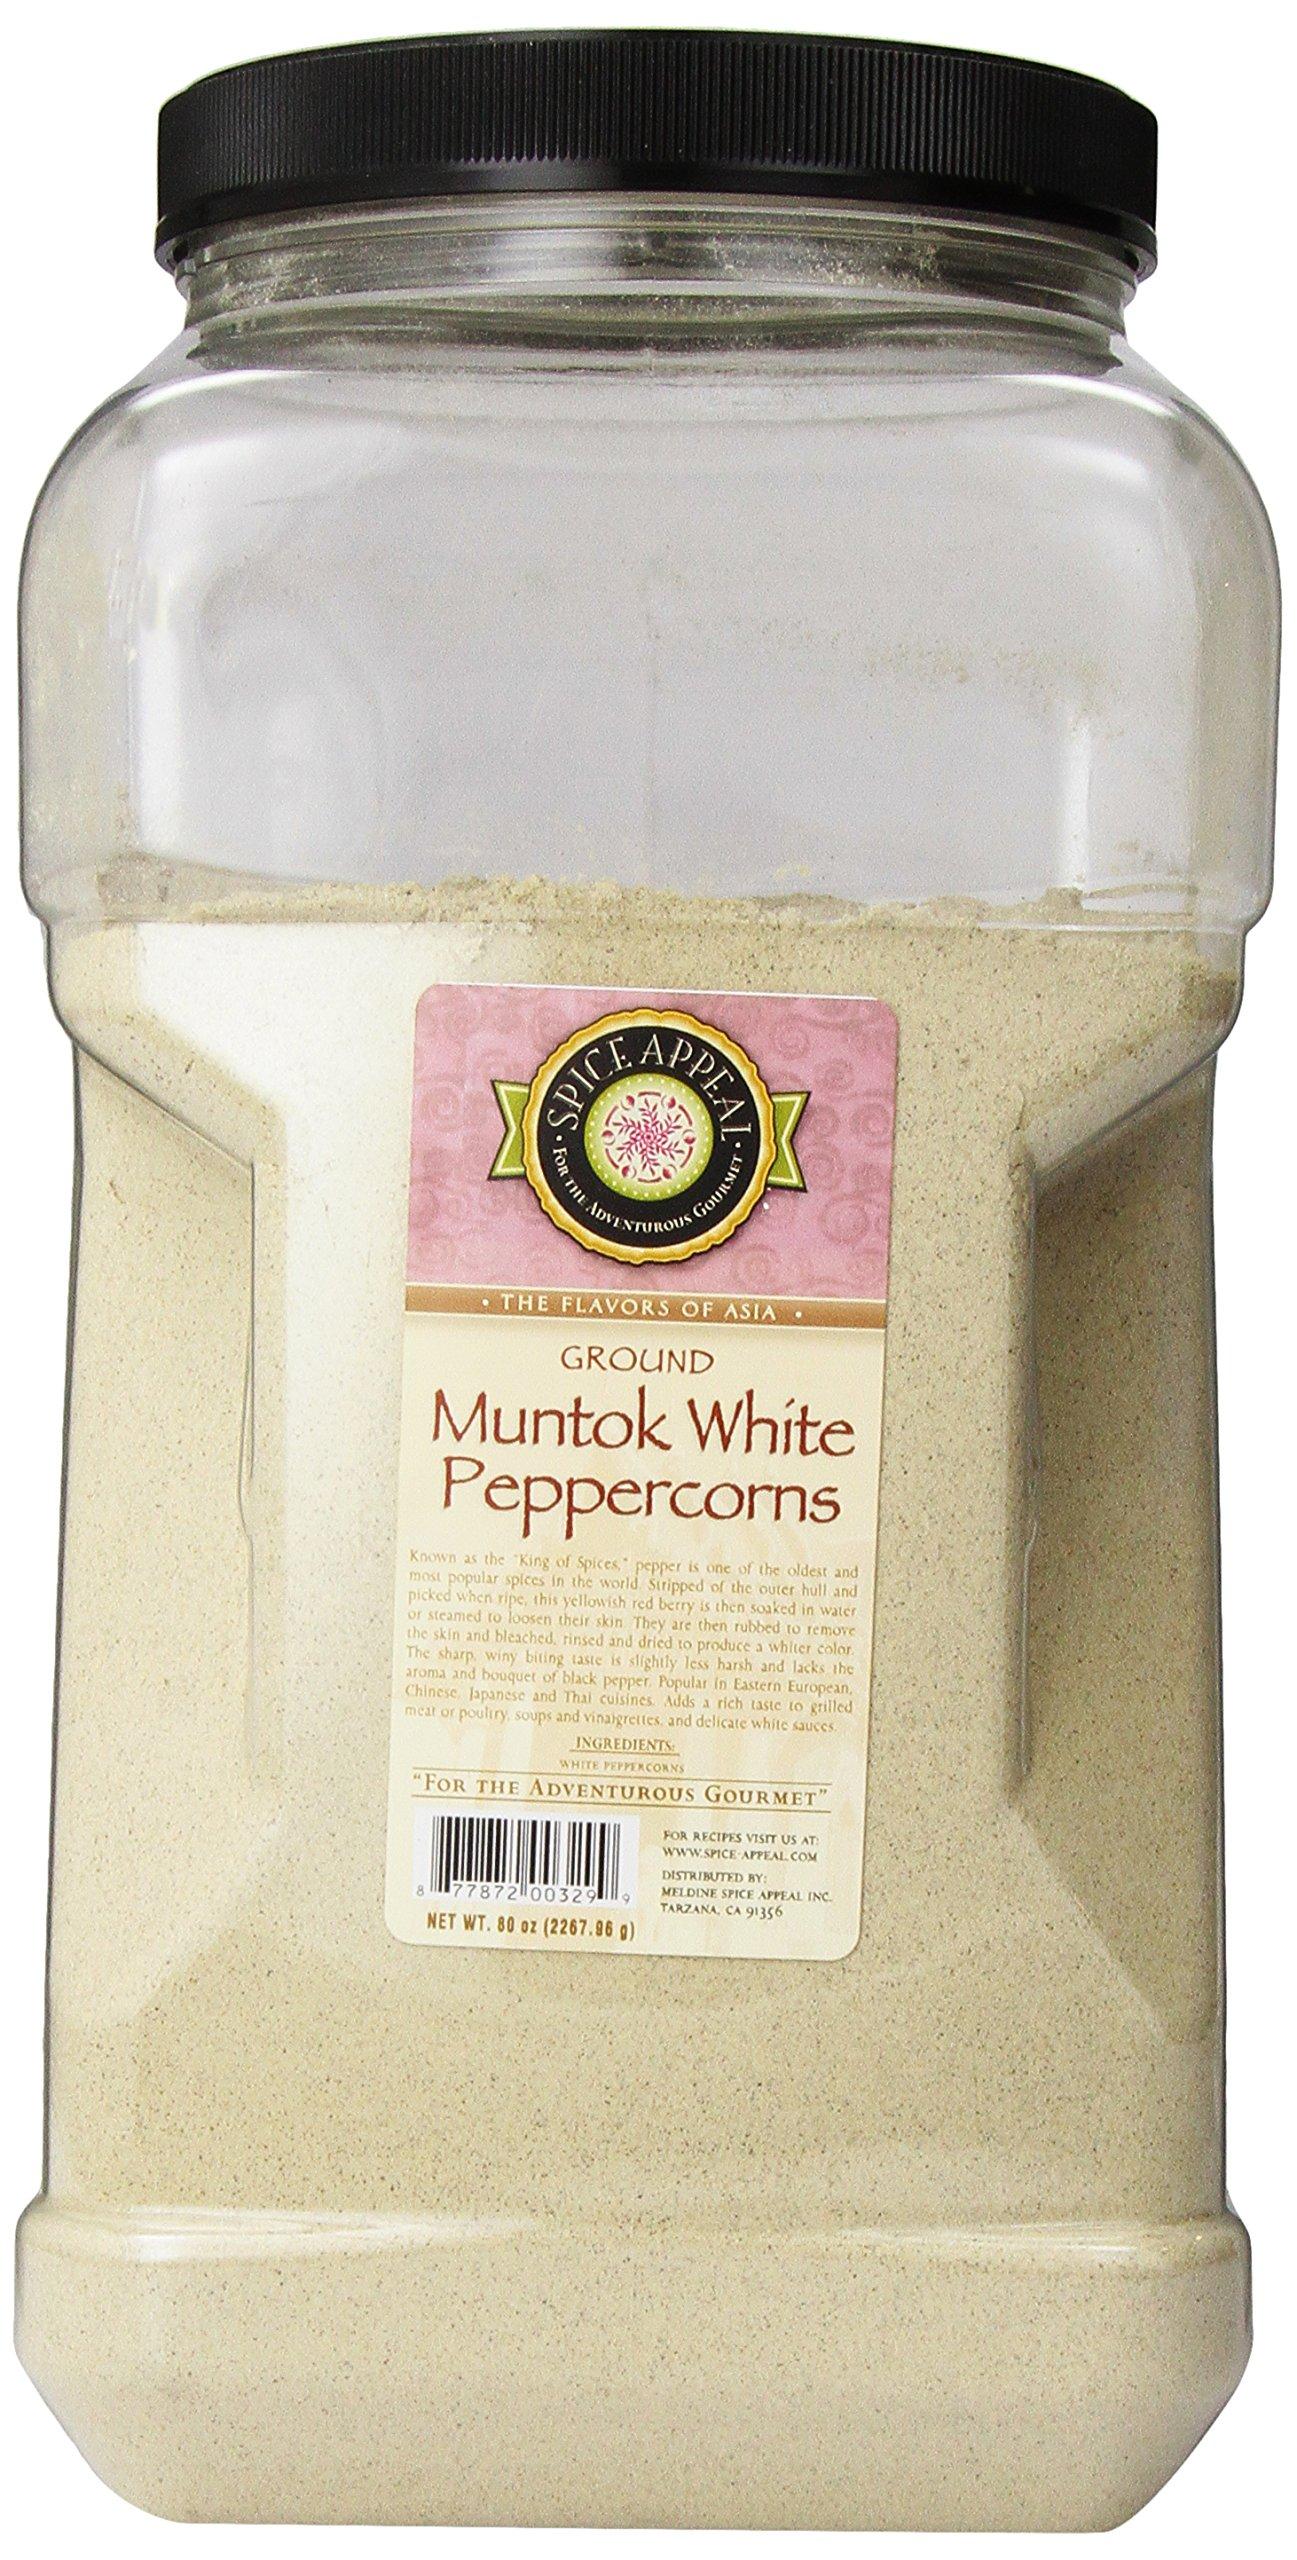 Spice Appeal Muntok White Peppercorns Ground, 80-Ounce Jar